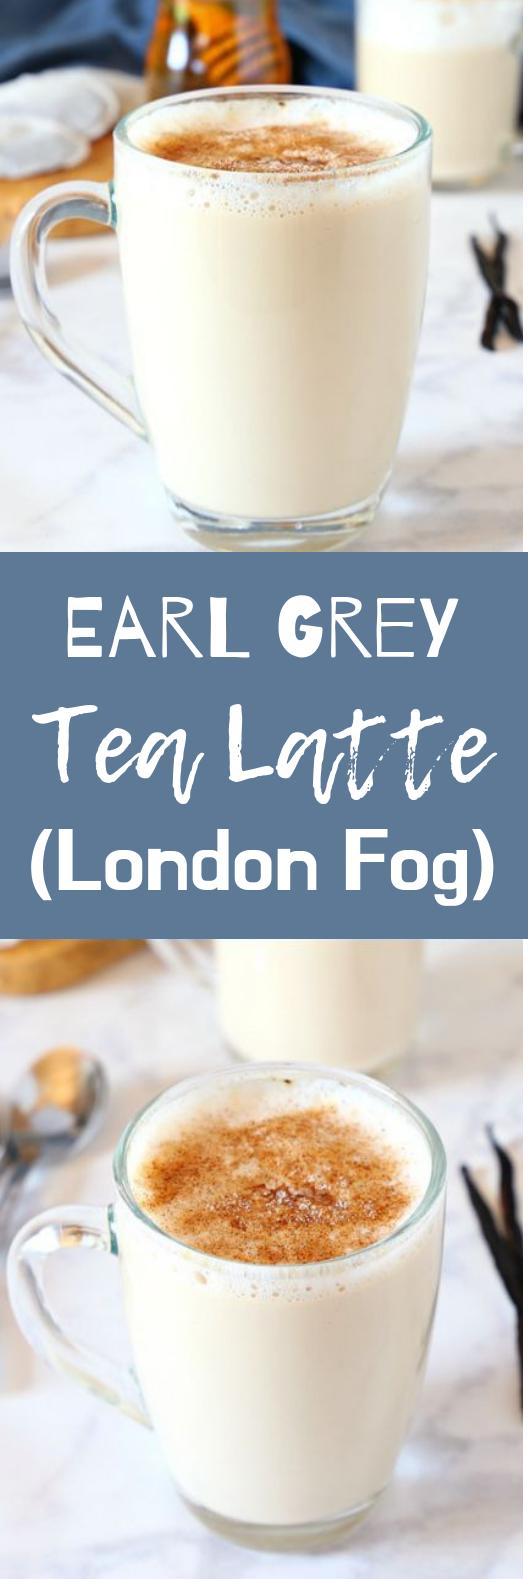 Earl Grey Vanilla Tea Latte (London Fog) #winter #drinks